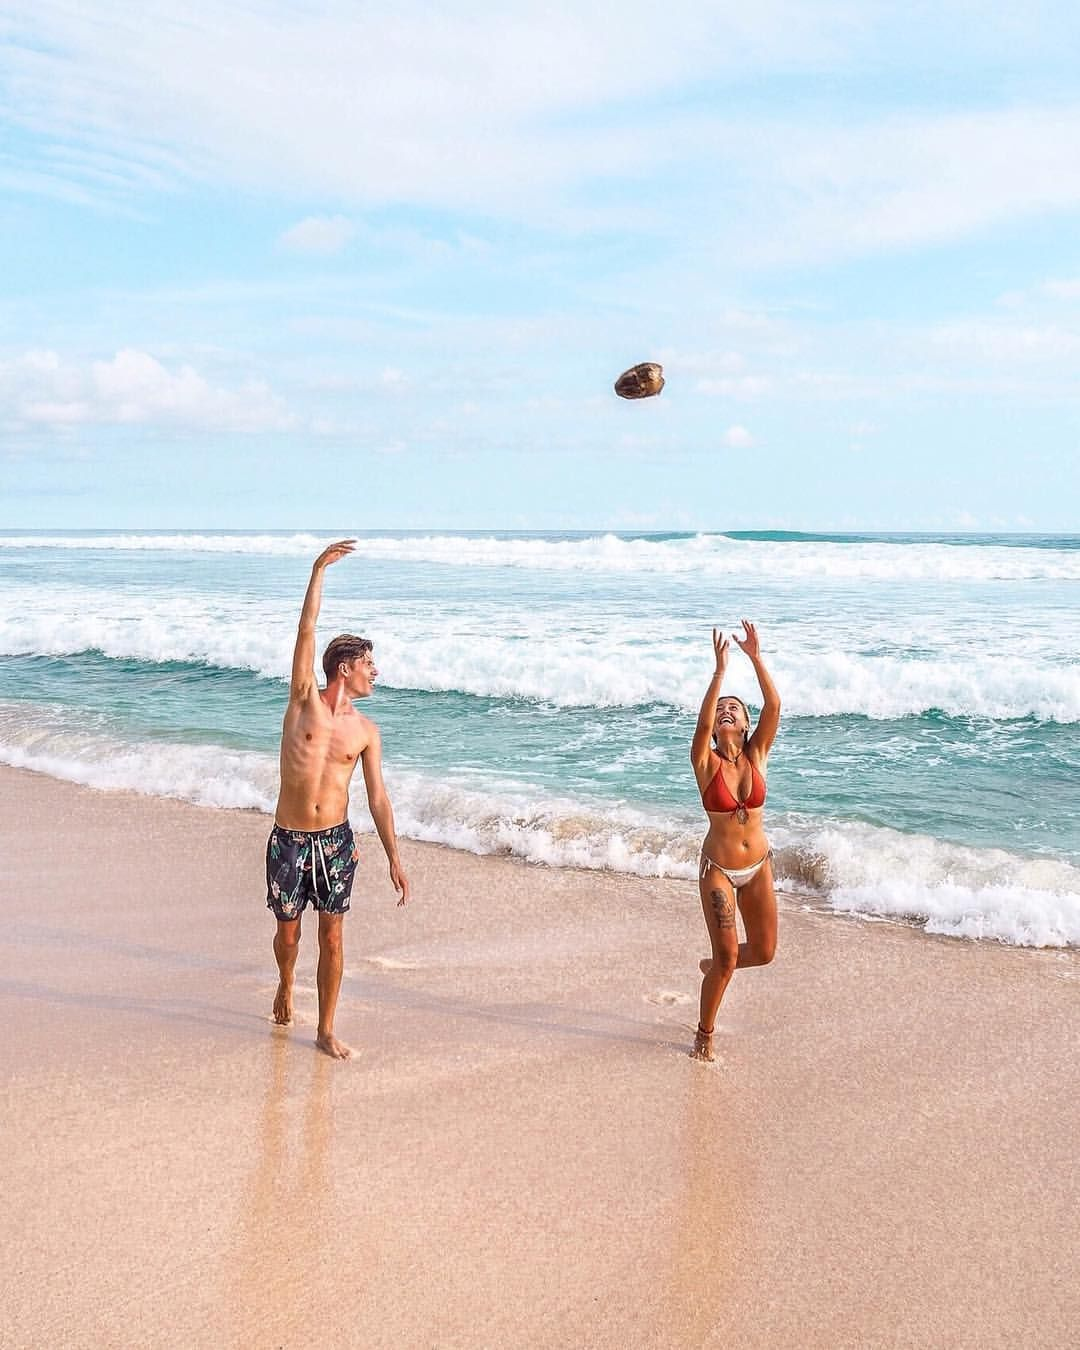 Shipwreck Nyang Nyang Beach Uluwatu Bukit Peninsula Bali - Charlie & Lauren UK Travel Couple - Wanderers & Warriors